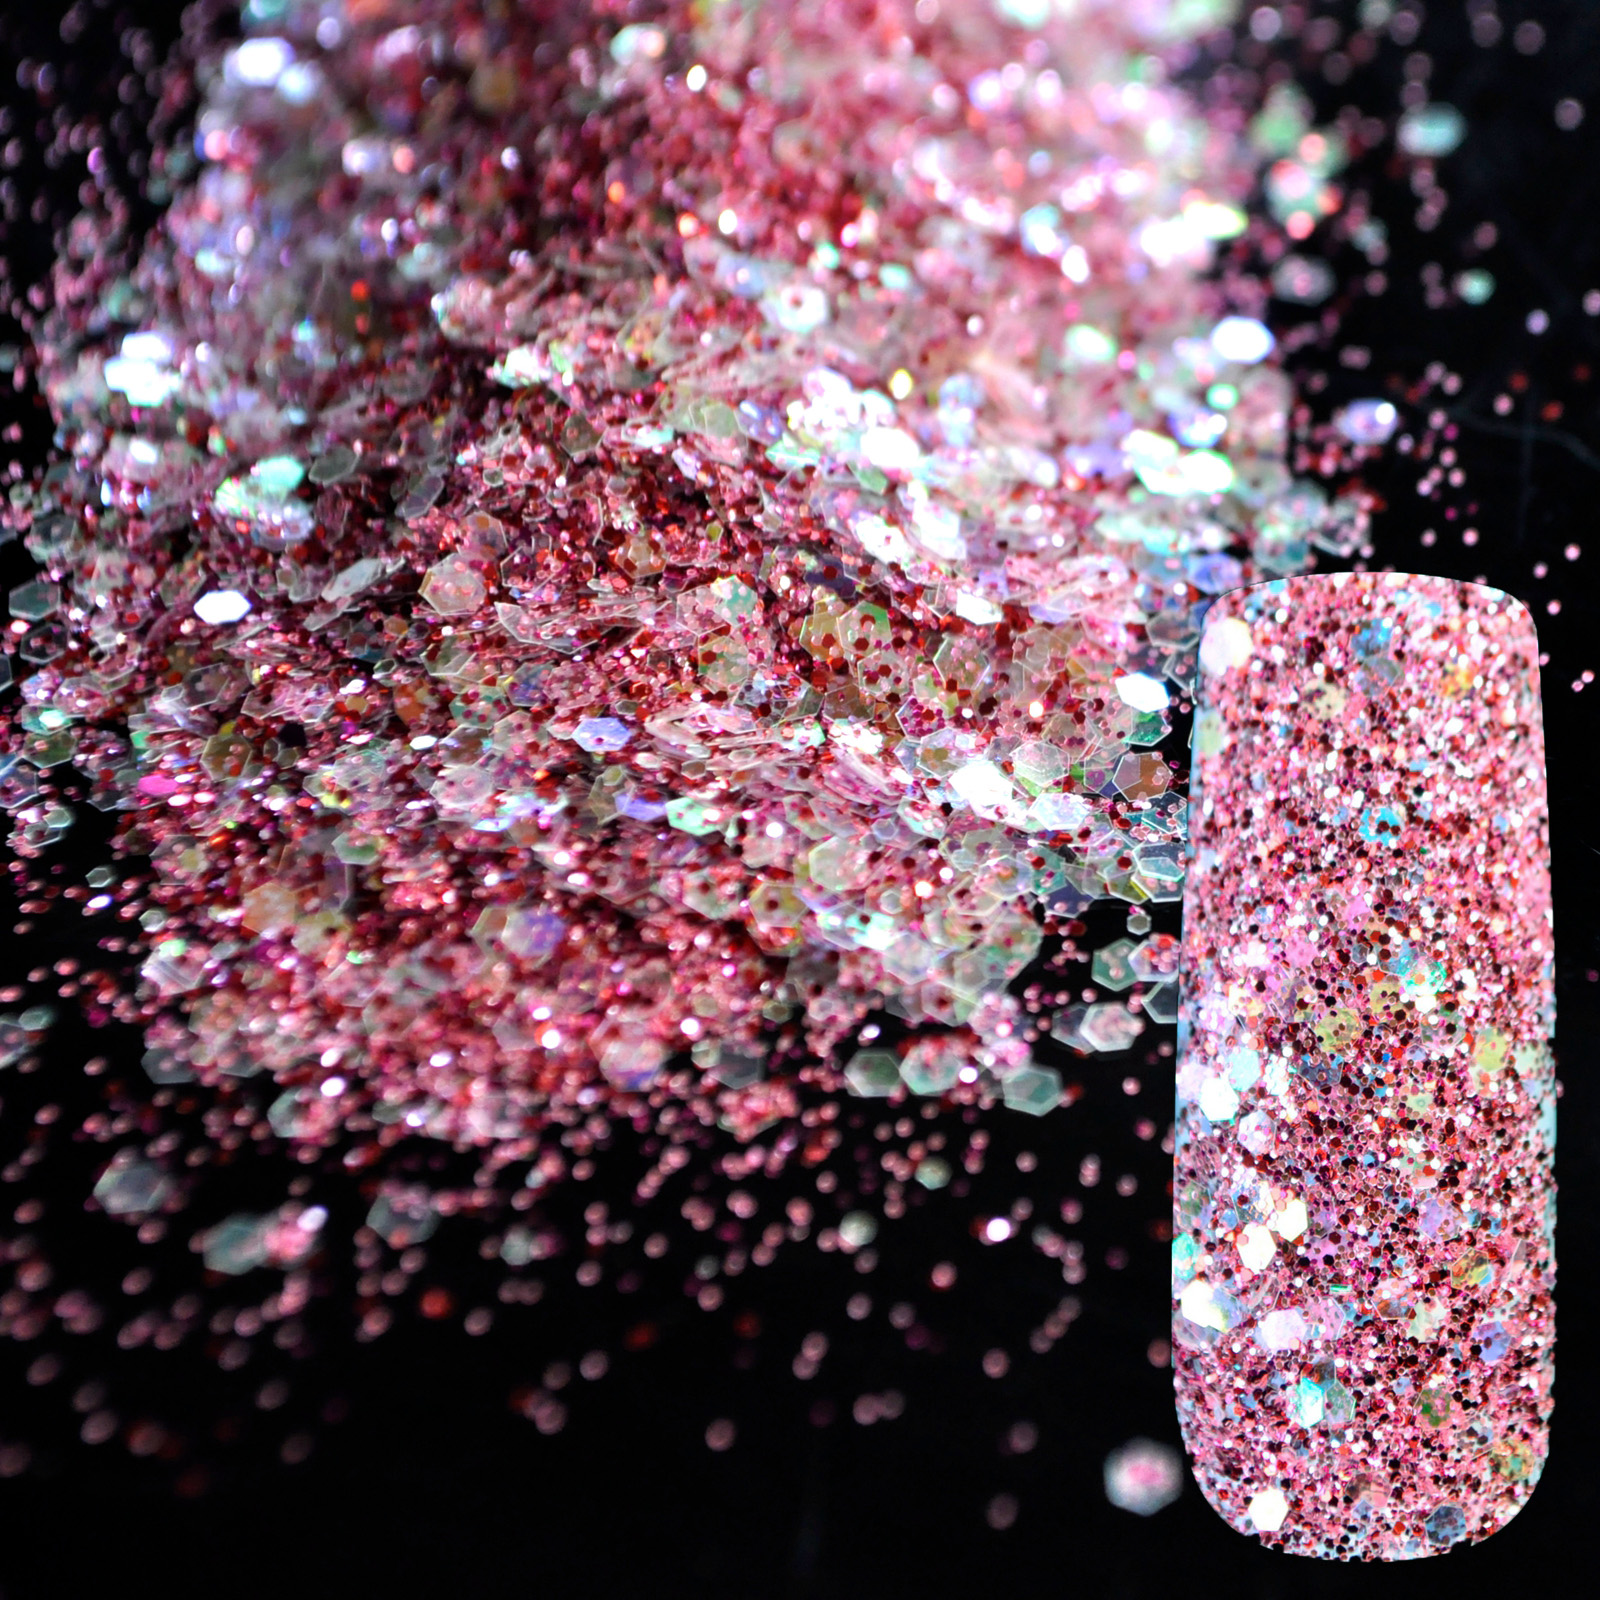 Nagelglitzer Mix Größe Shinning Raibow Rosa Roten Nagel Glitter Pulver Diy Nail Art Pailletten Dekorationen Hexagonal Blatt Diy Nail Art Material 278 2019 New Fashion Style Online